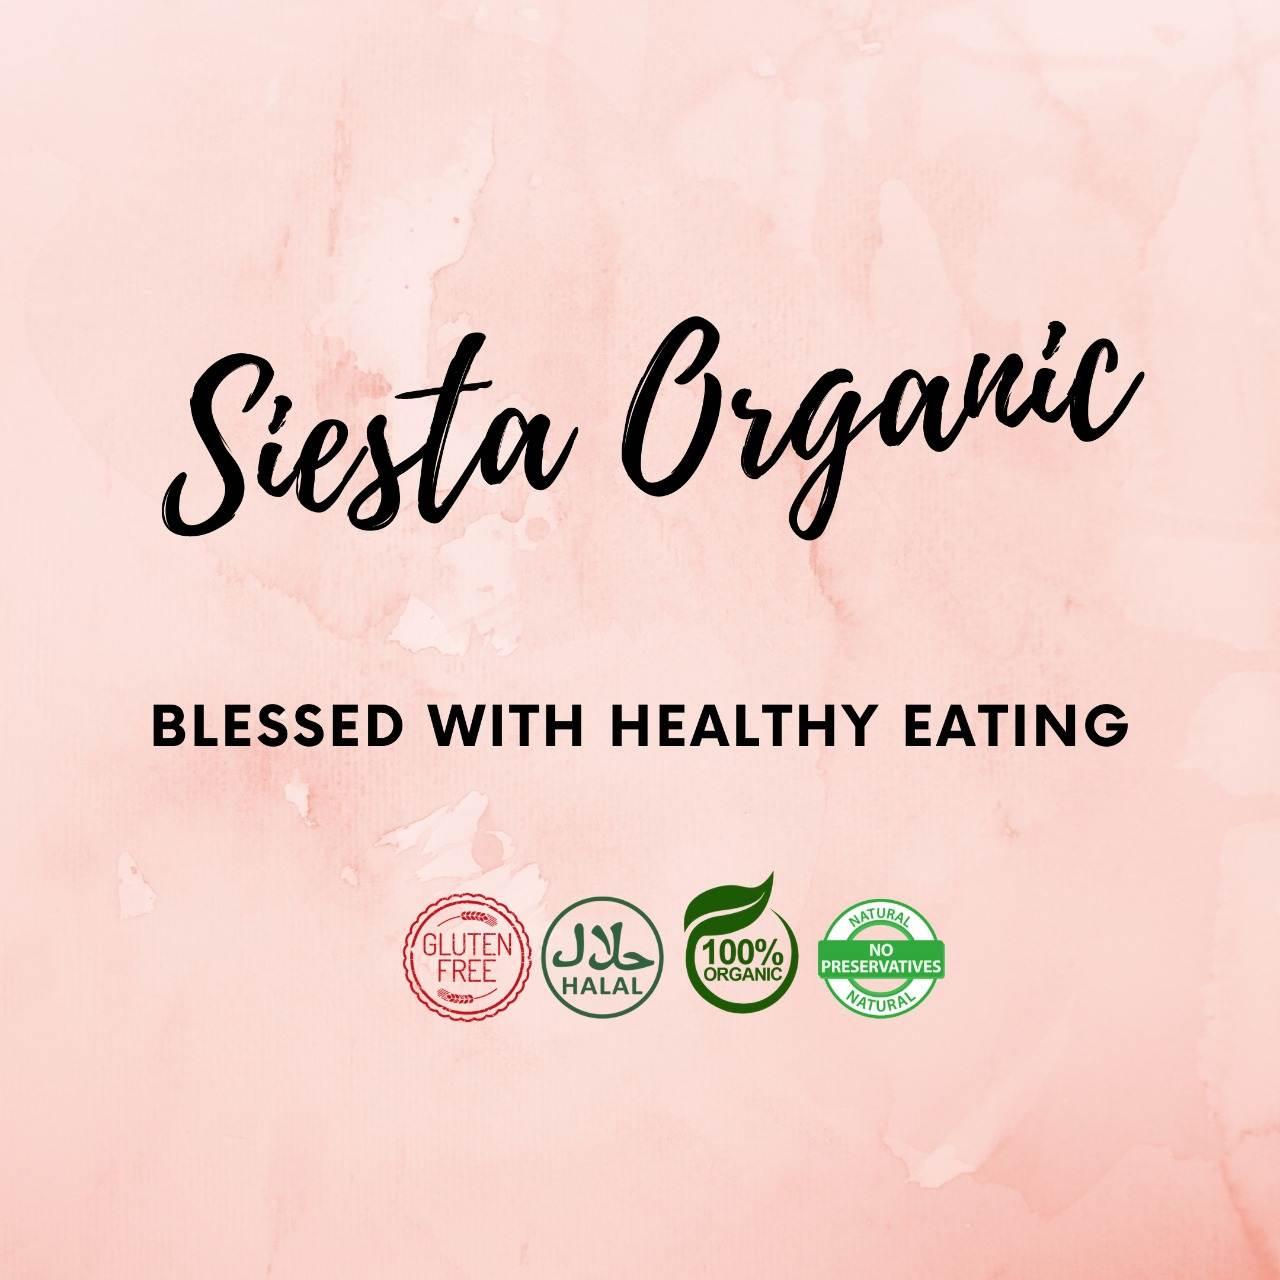 Siesta Organic